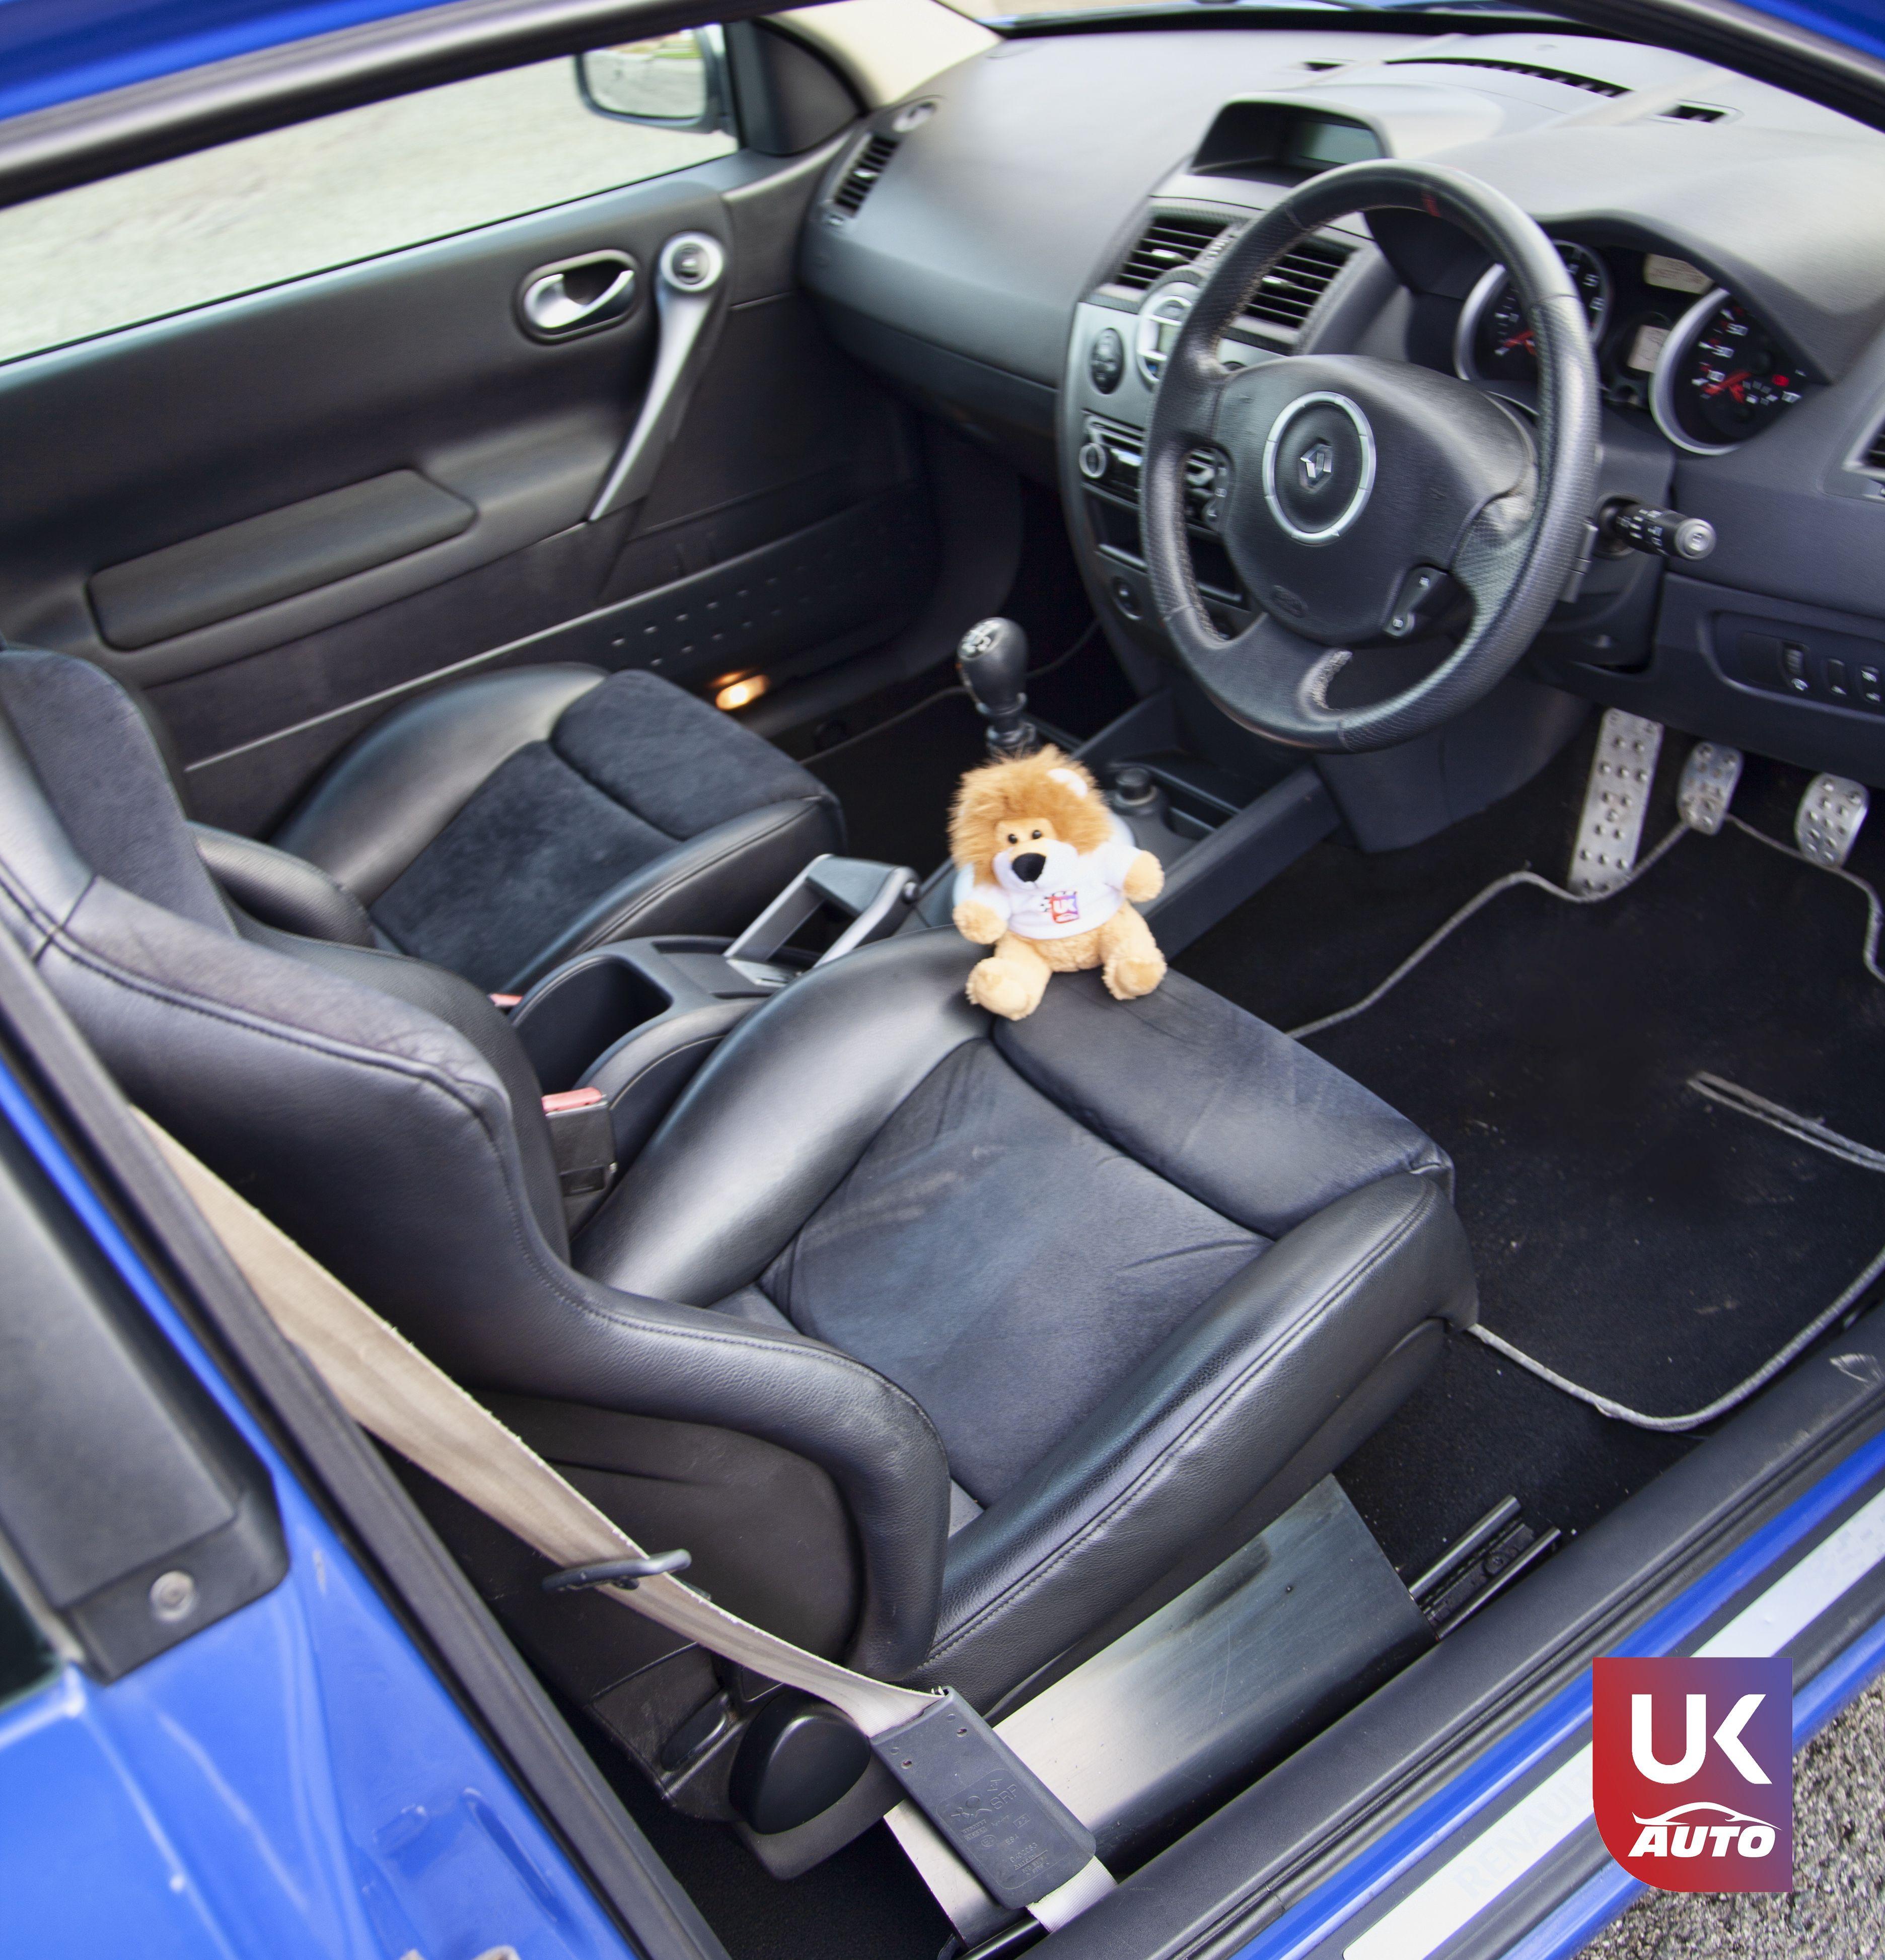 Renault F1 Team R26 Steering Wheel: Import UK Renault Megane RS R26 F1 TEAM Par Https://ukauto